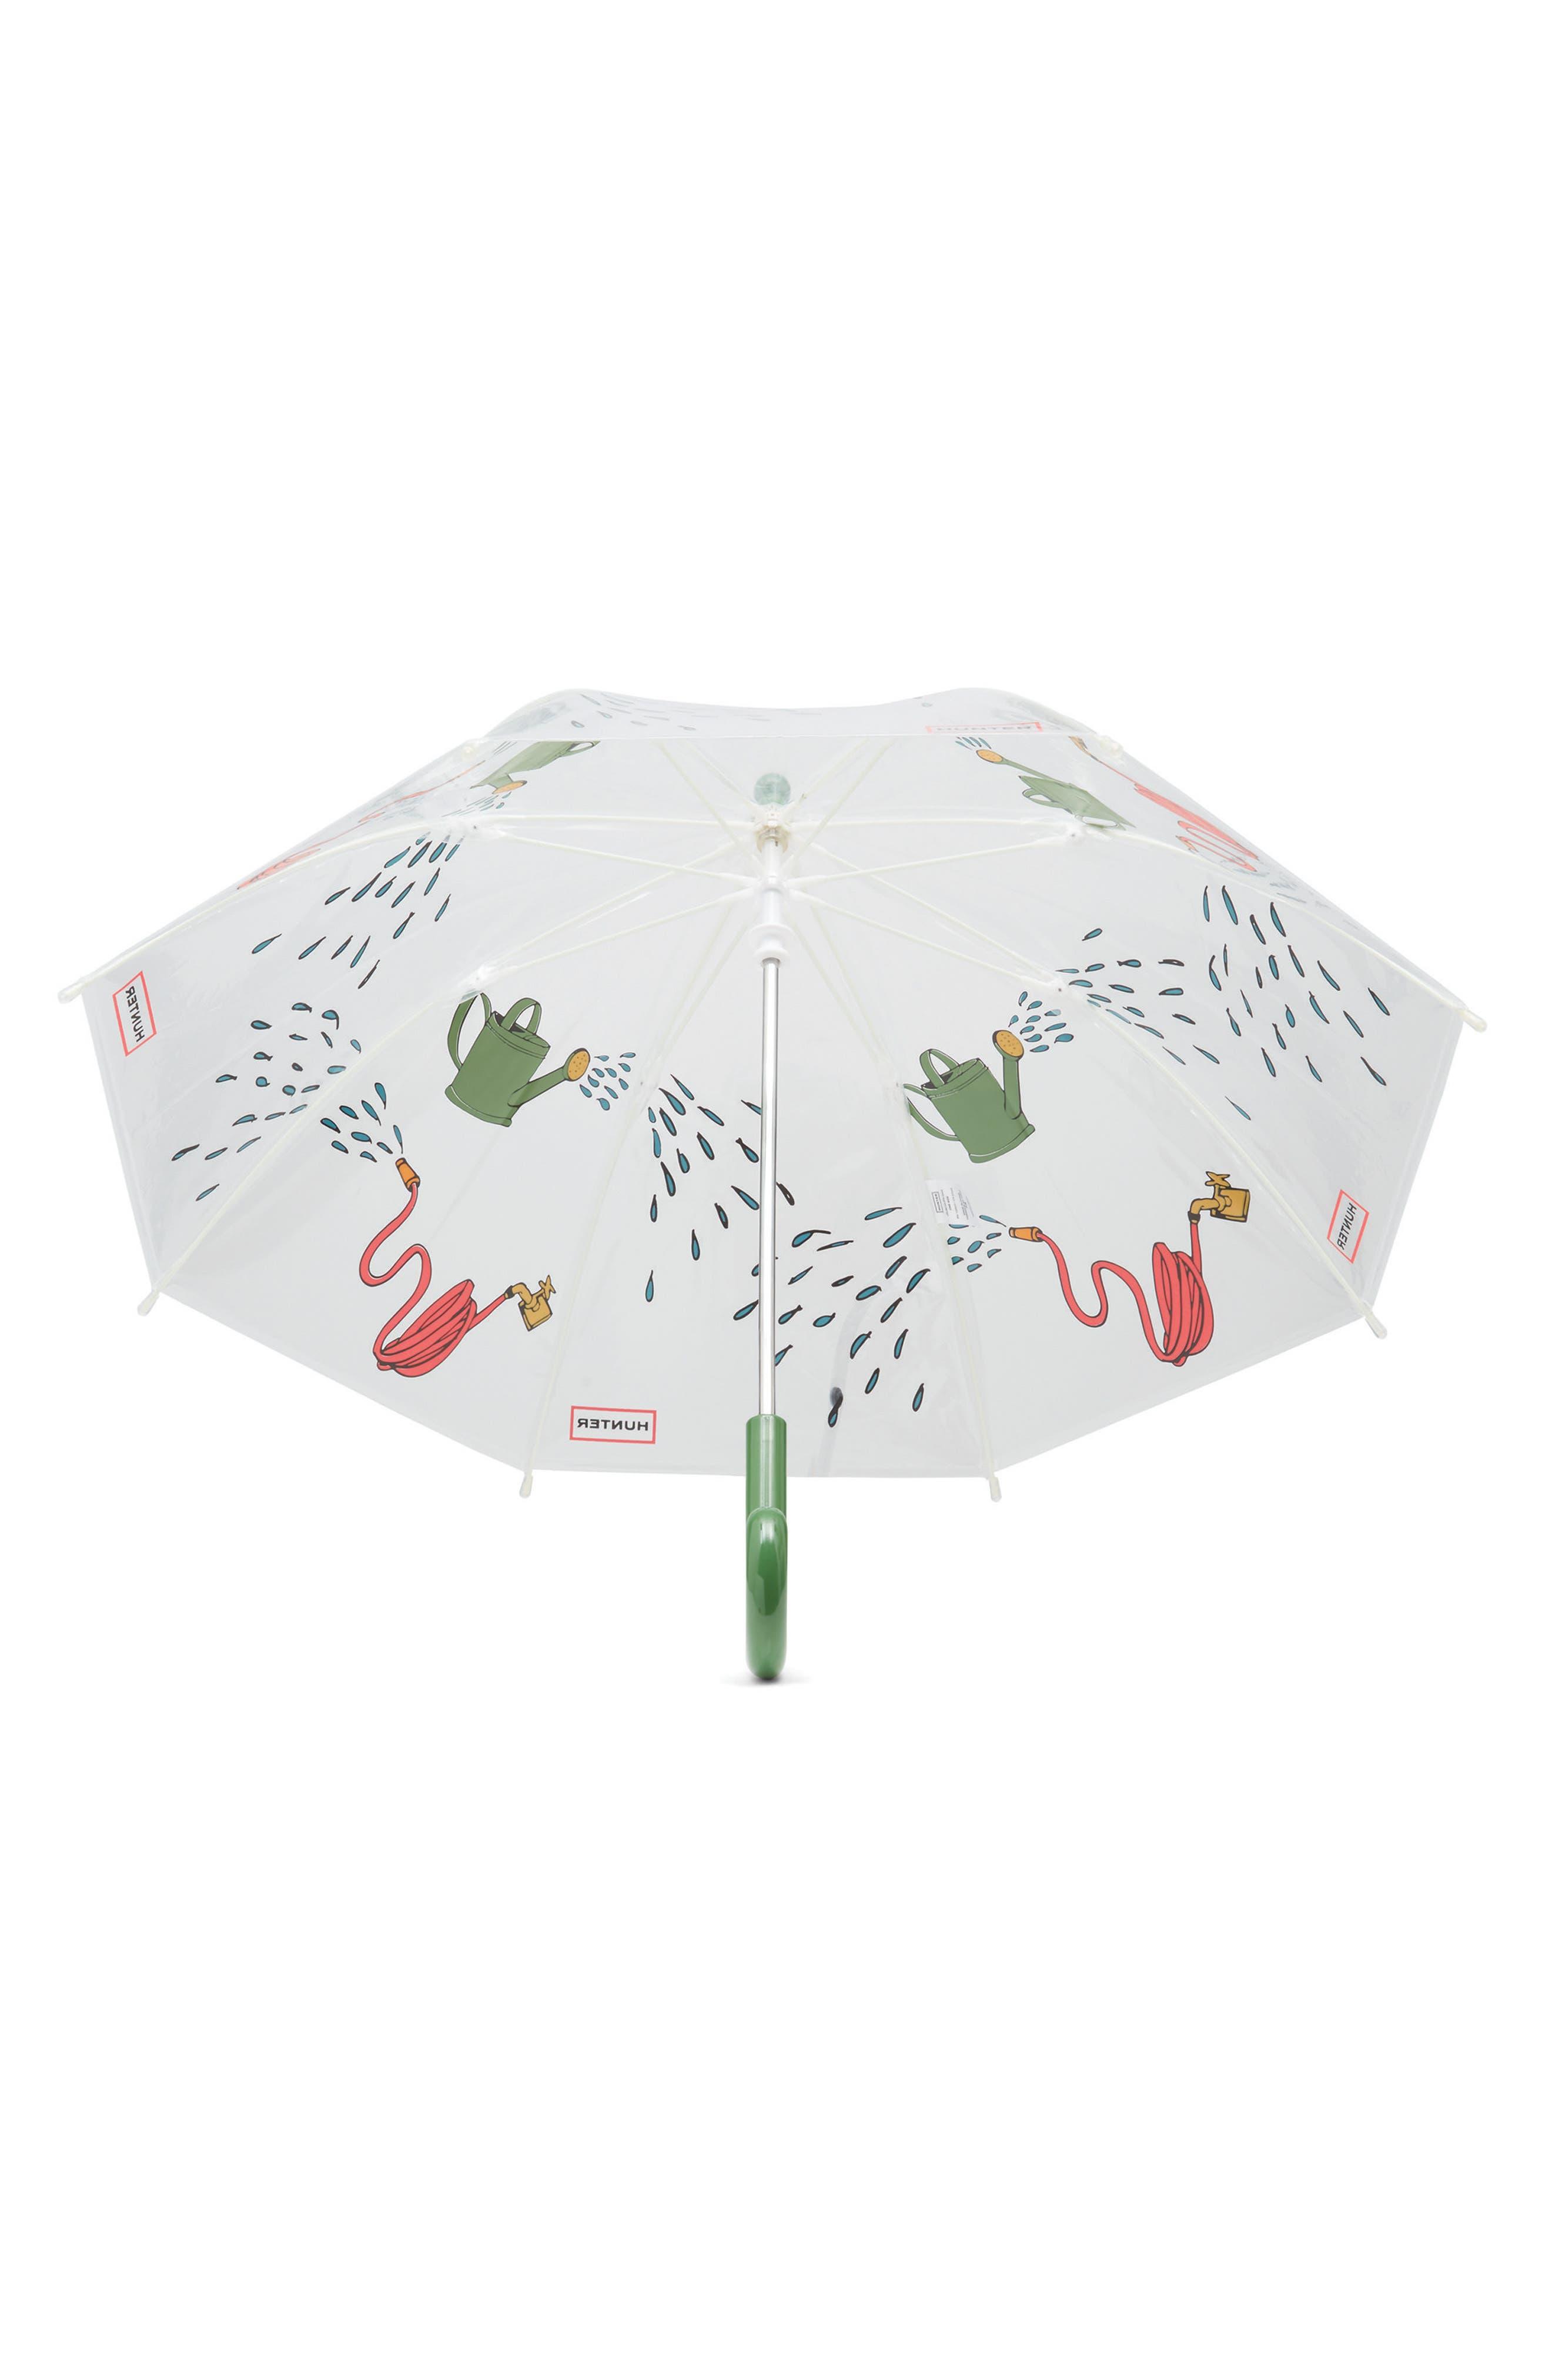 Watering Can Umbrella,                             Alternate thumbnail 3, color,                             Gardening Print